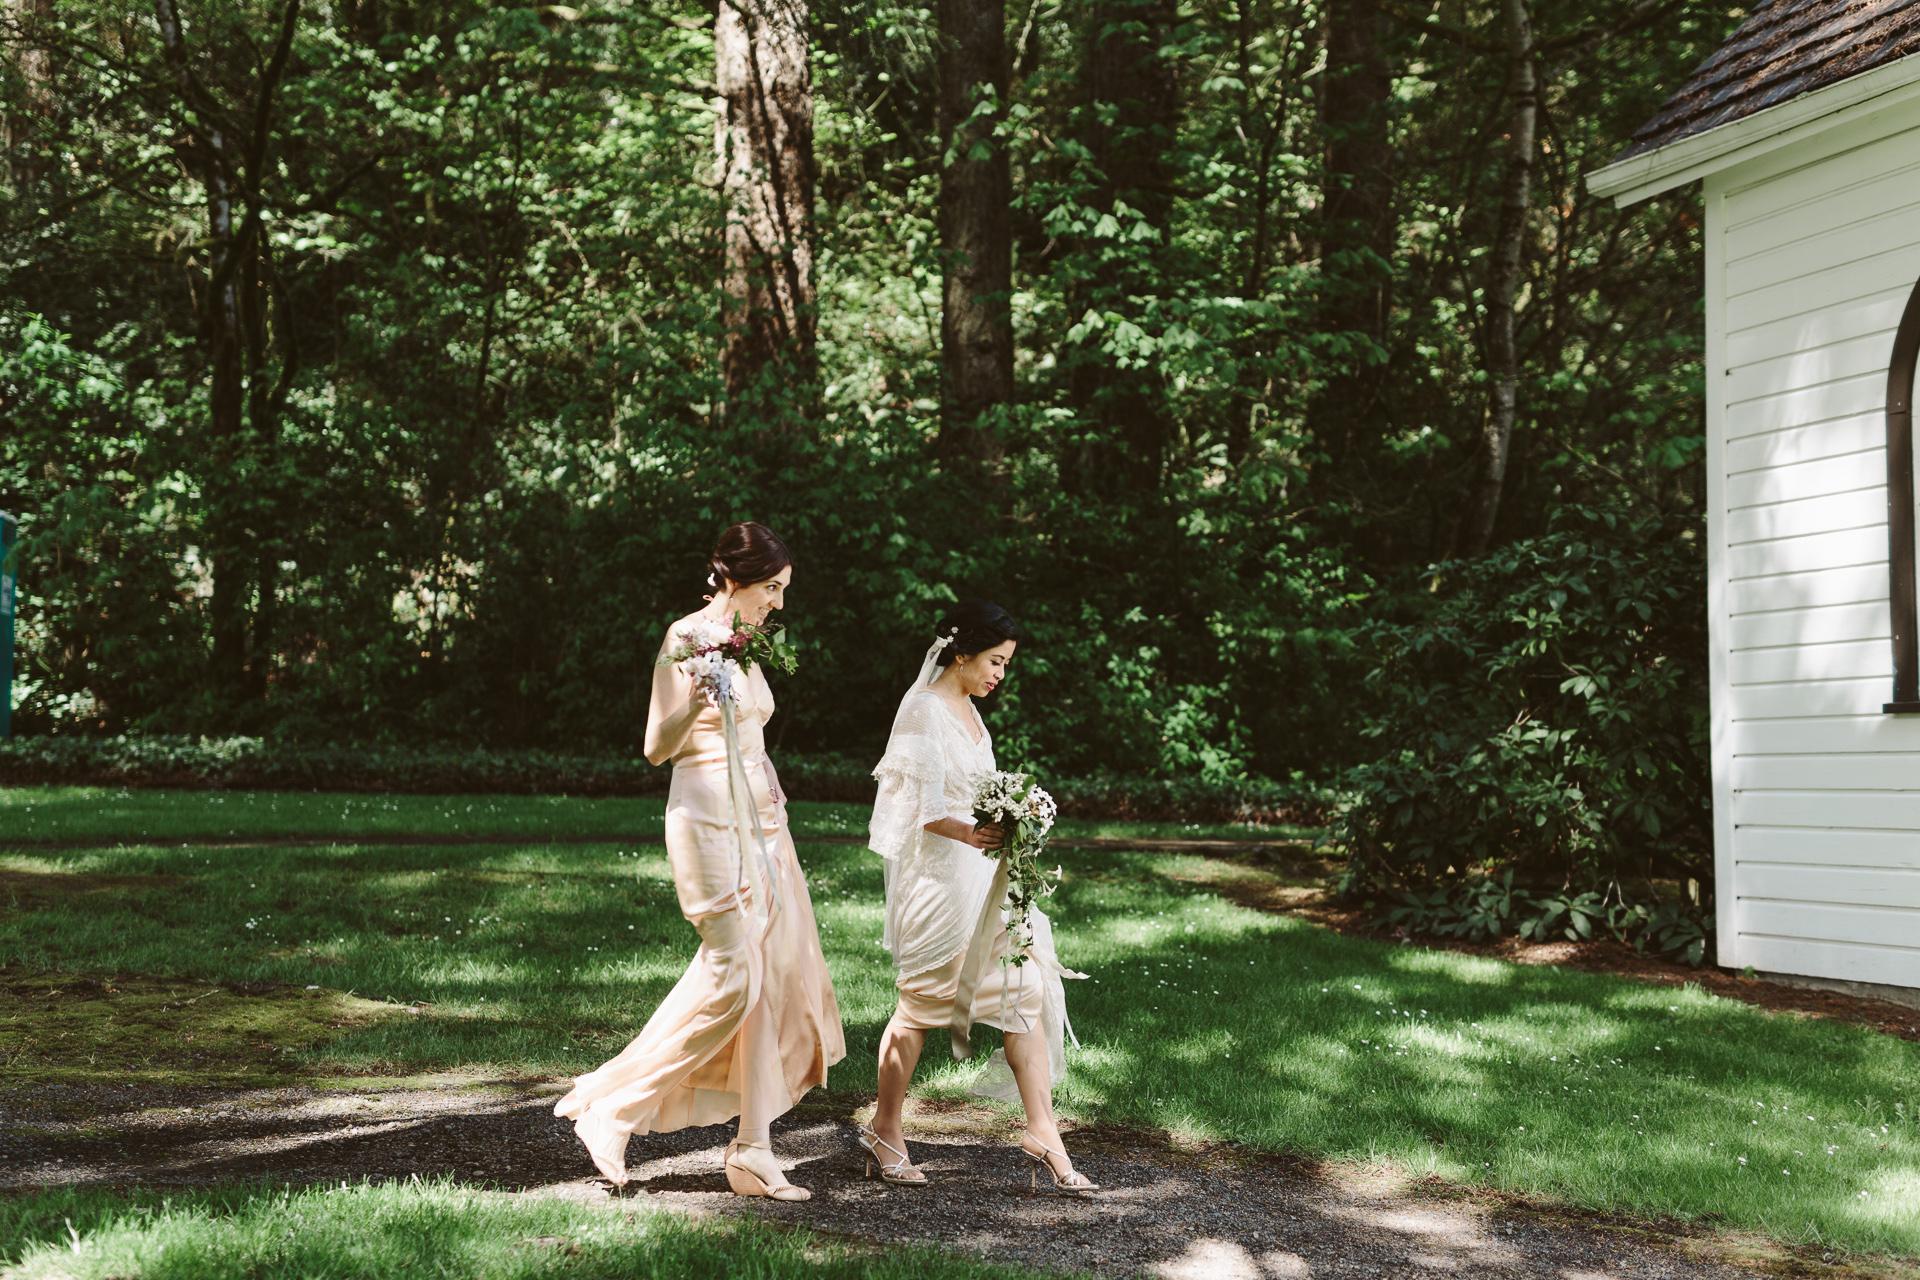 intimate-wedding-portland-oregon-jess-hunter-photography-0432.jpg